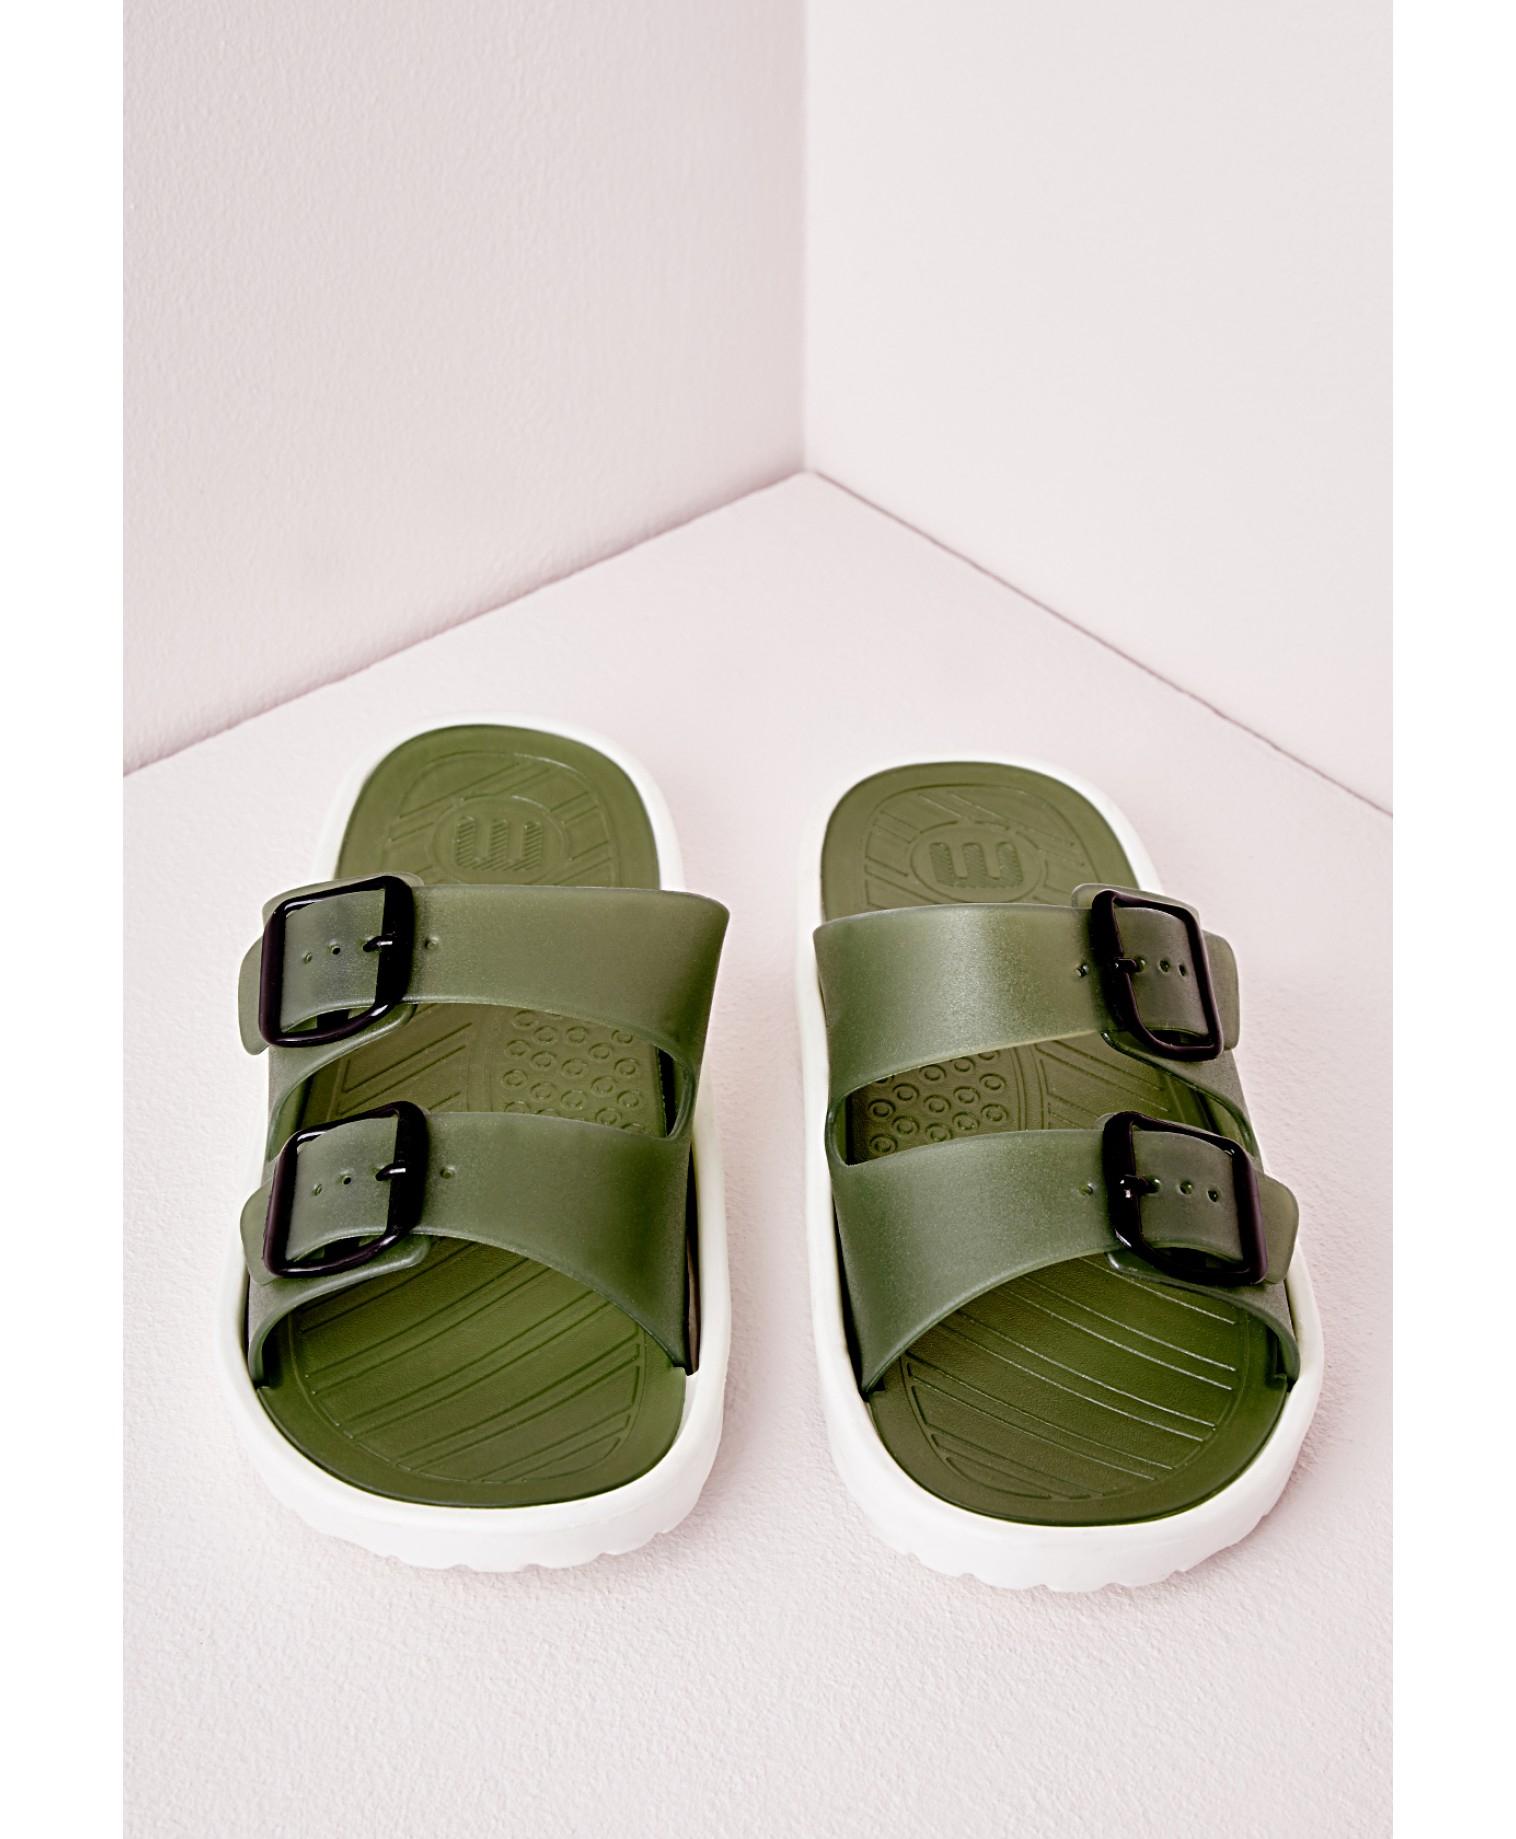 Missguided flexi double strap buckled sandal khaki in khaki lyst - Missguided head office address ...